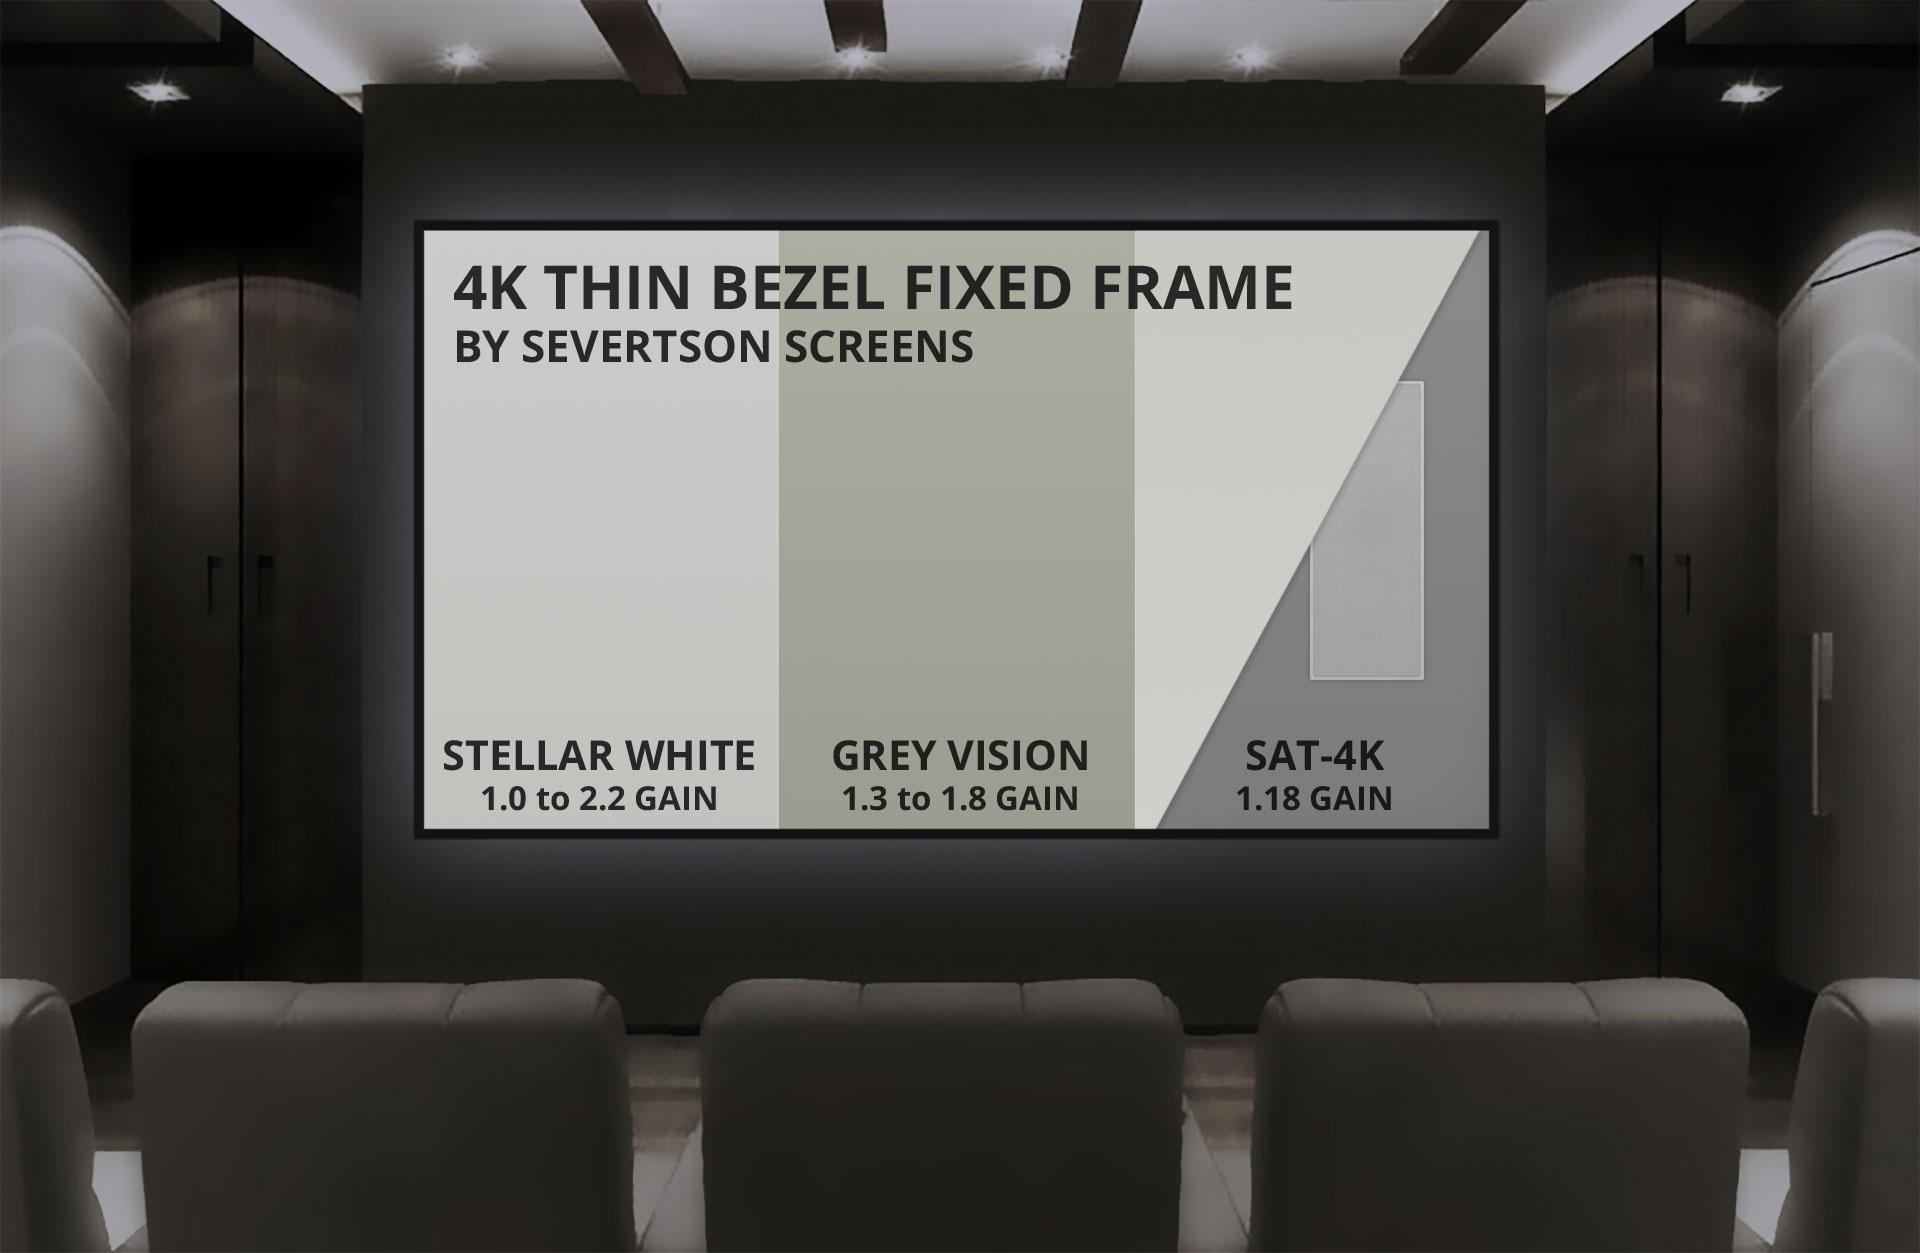 Severtson 4K Thin Bezel Fixed Screen